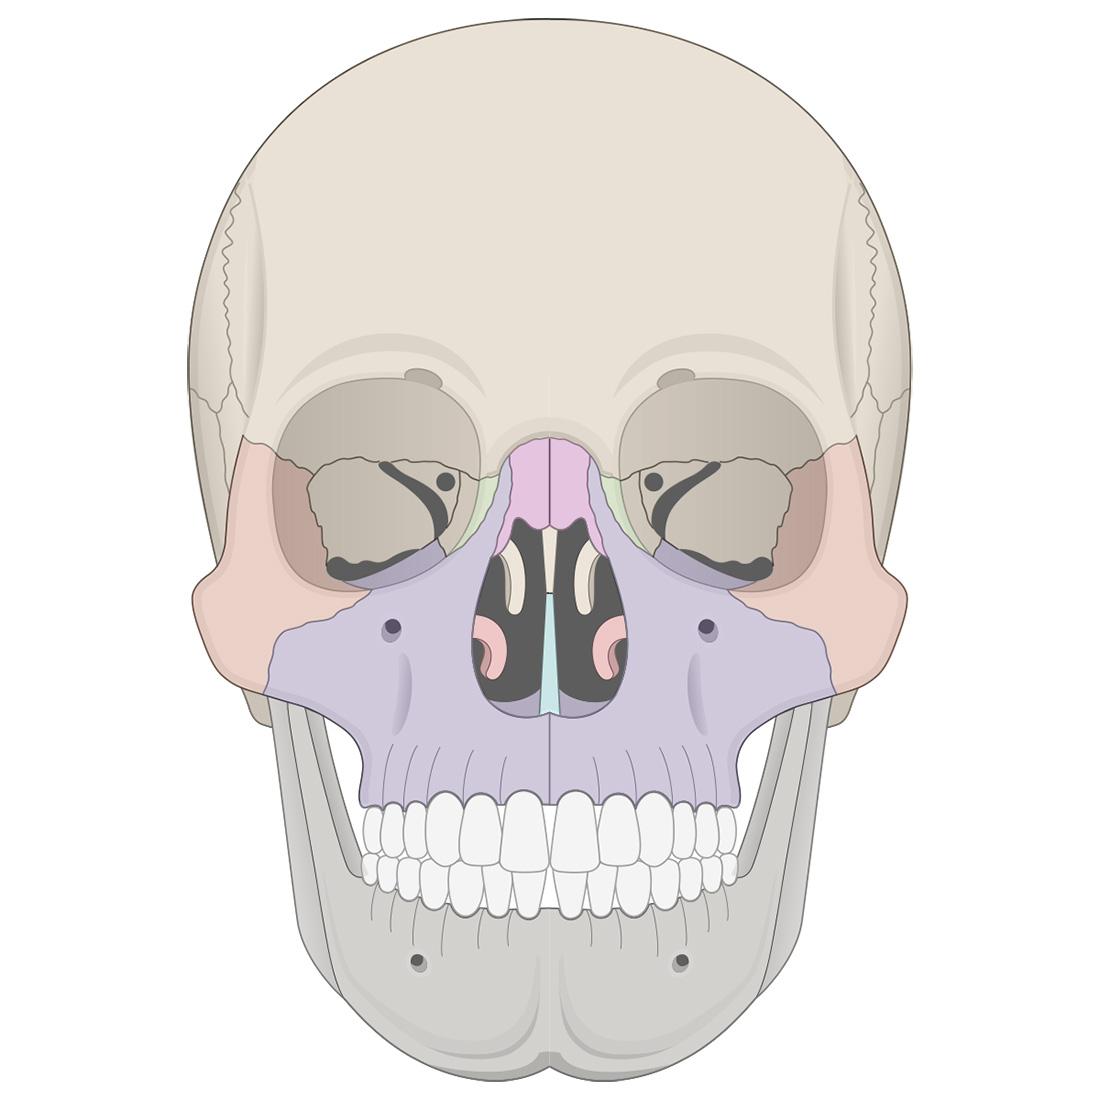 Facial bones: anterior view of the skull